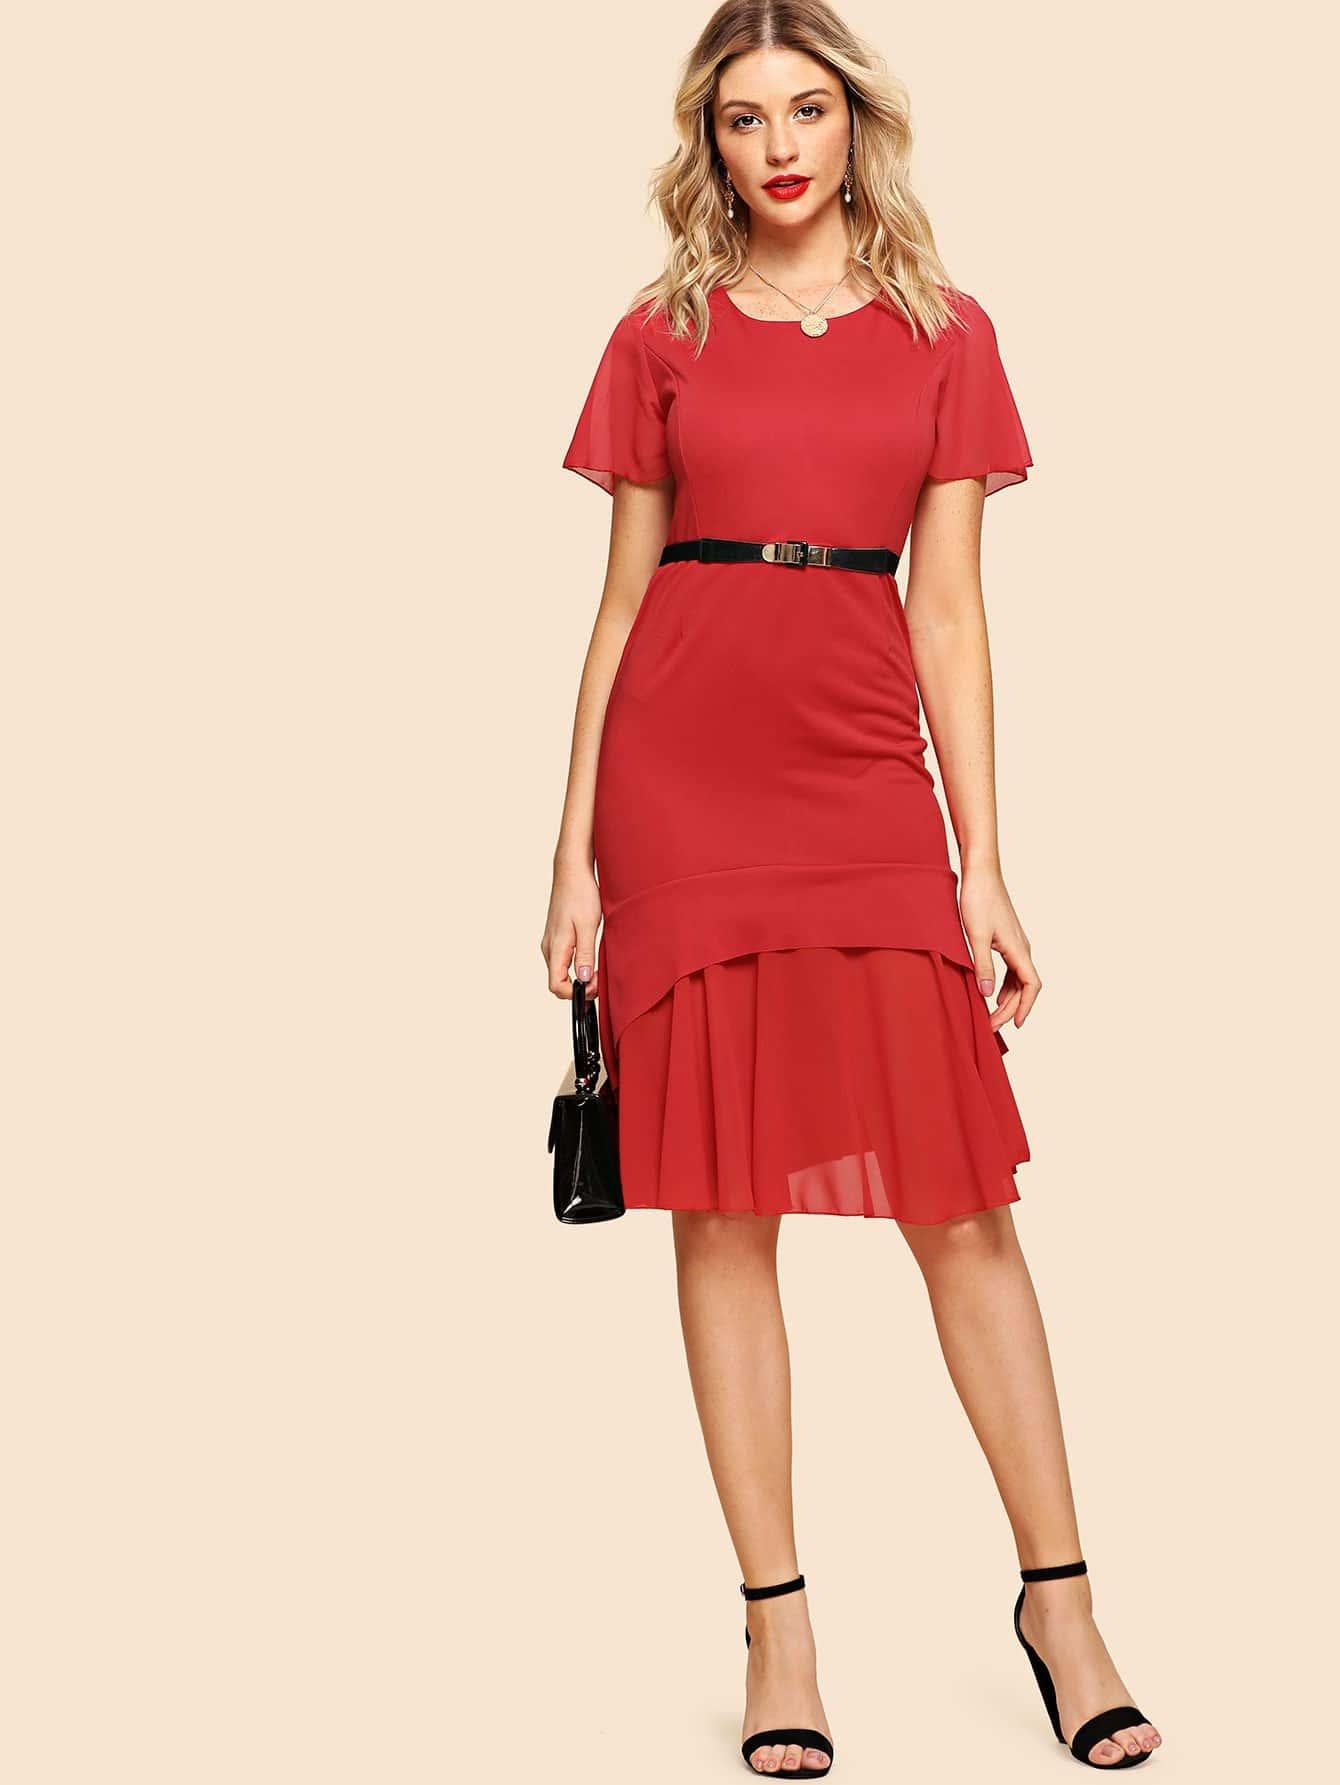 Ruffle Hem Chiffon Contrast Dress stripe contrast ruffle hem hooded dress